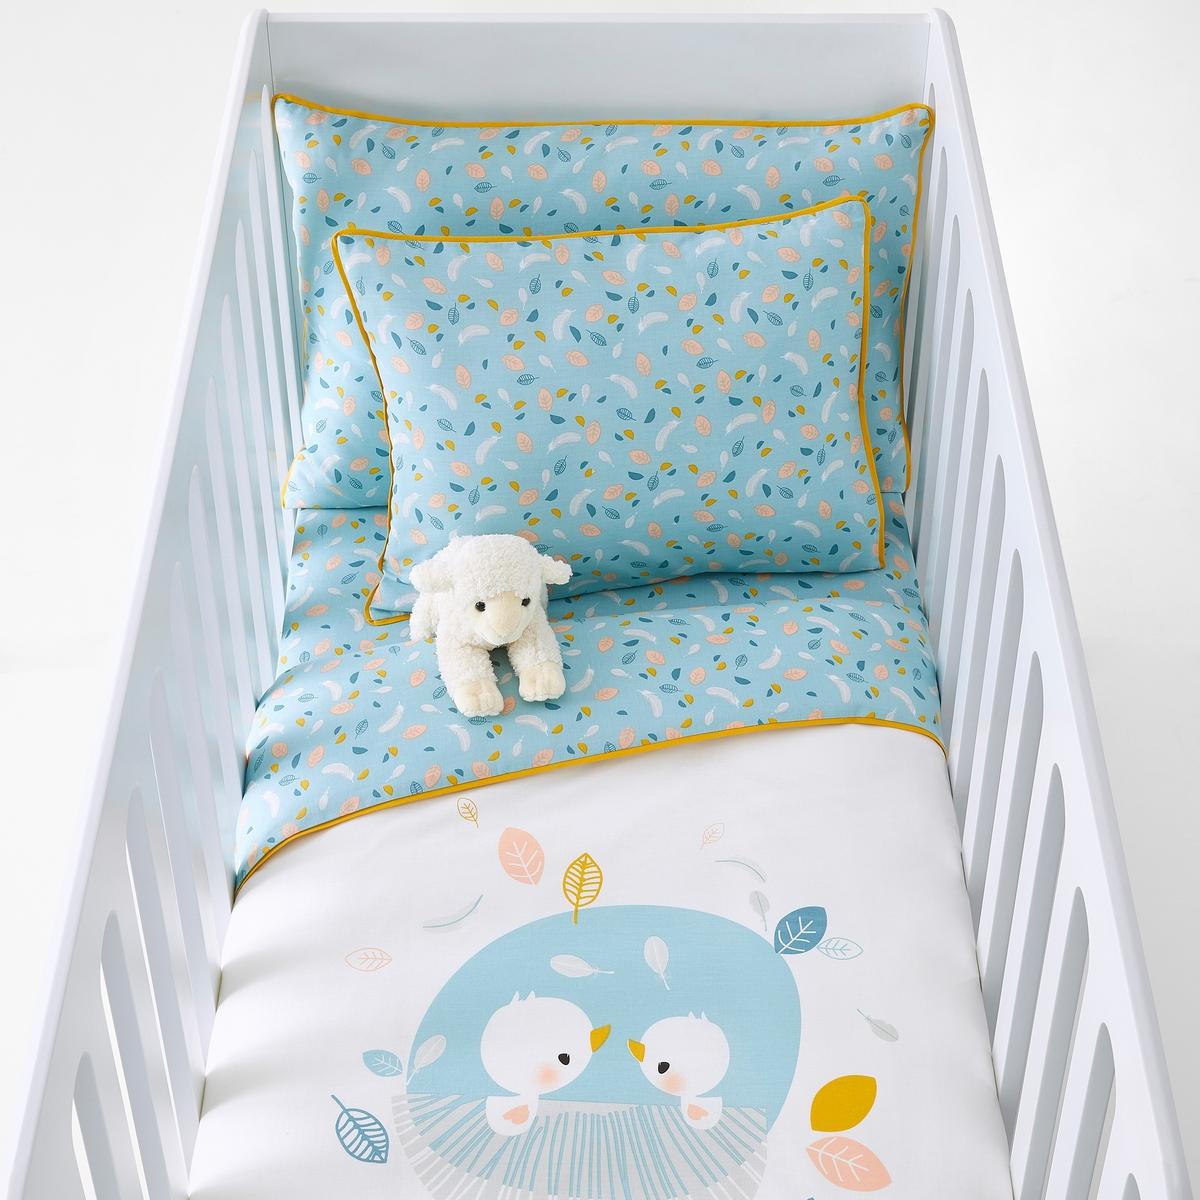 Baby-Bettbezug DANS MON PETIT NID | Kinderzimmer | Baumwolle | La Redoute Interieurs